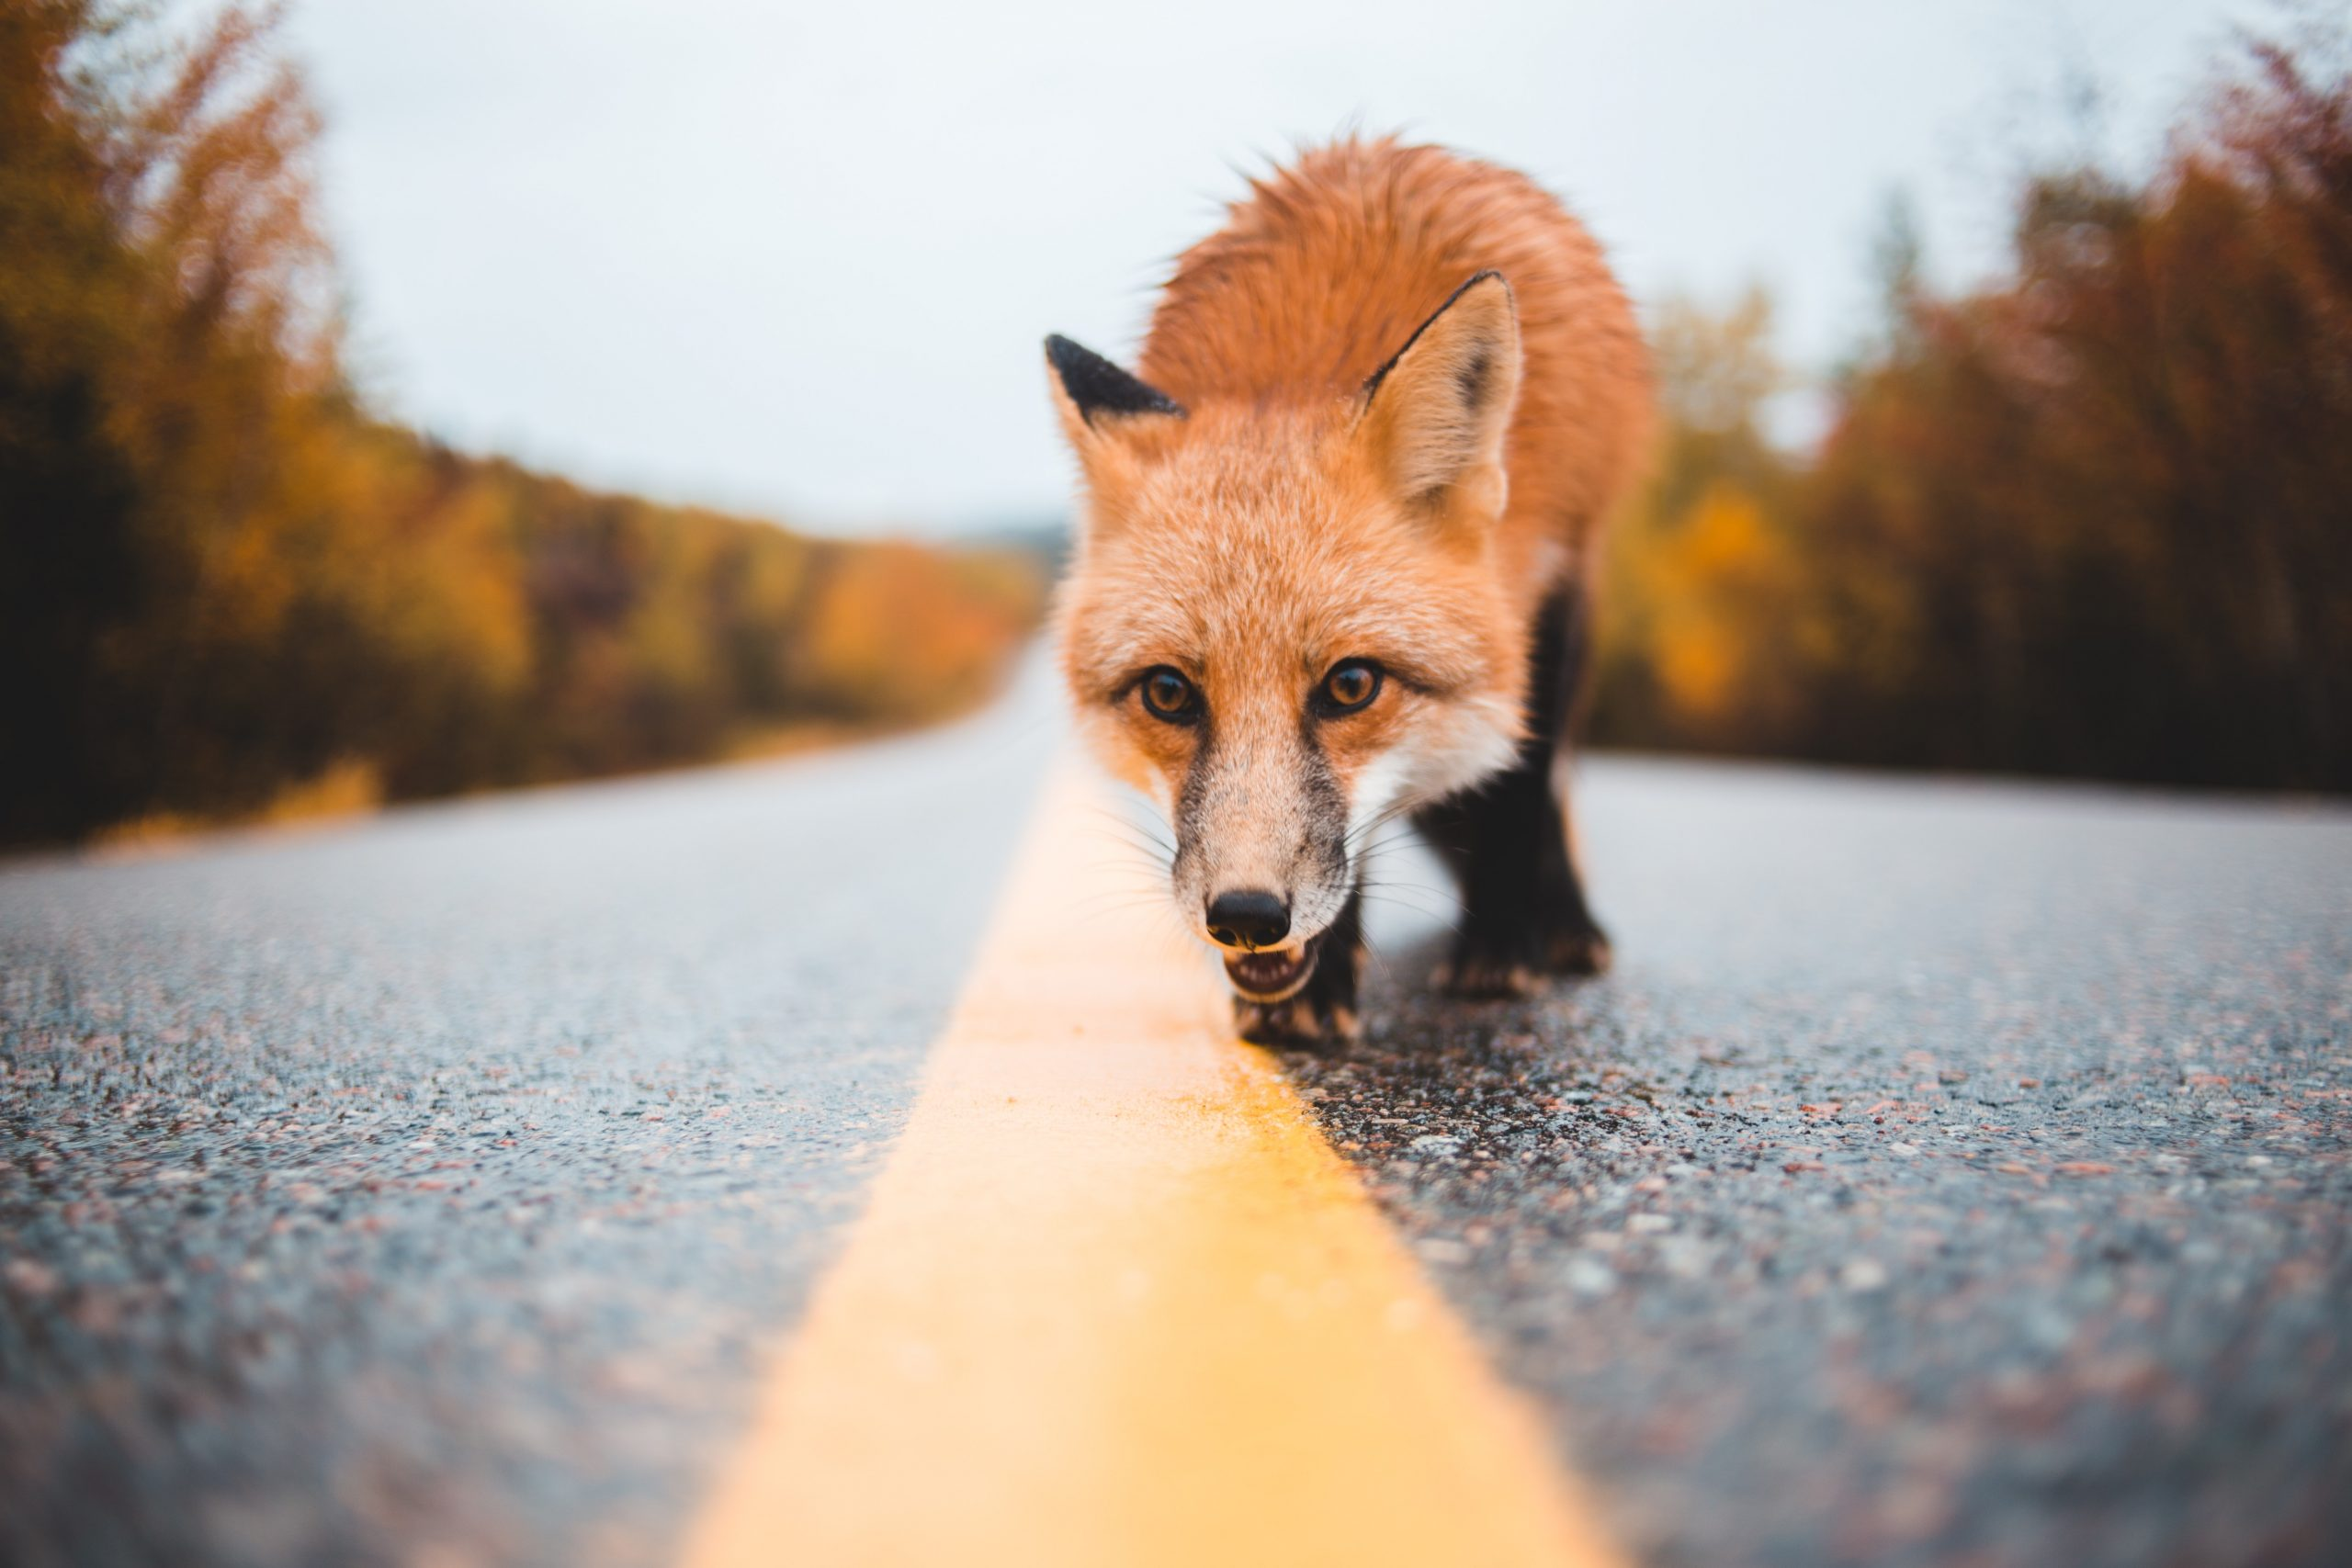 incidente stradale fauna selvatica